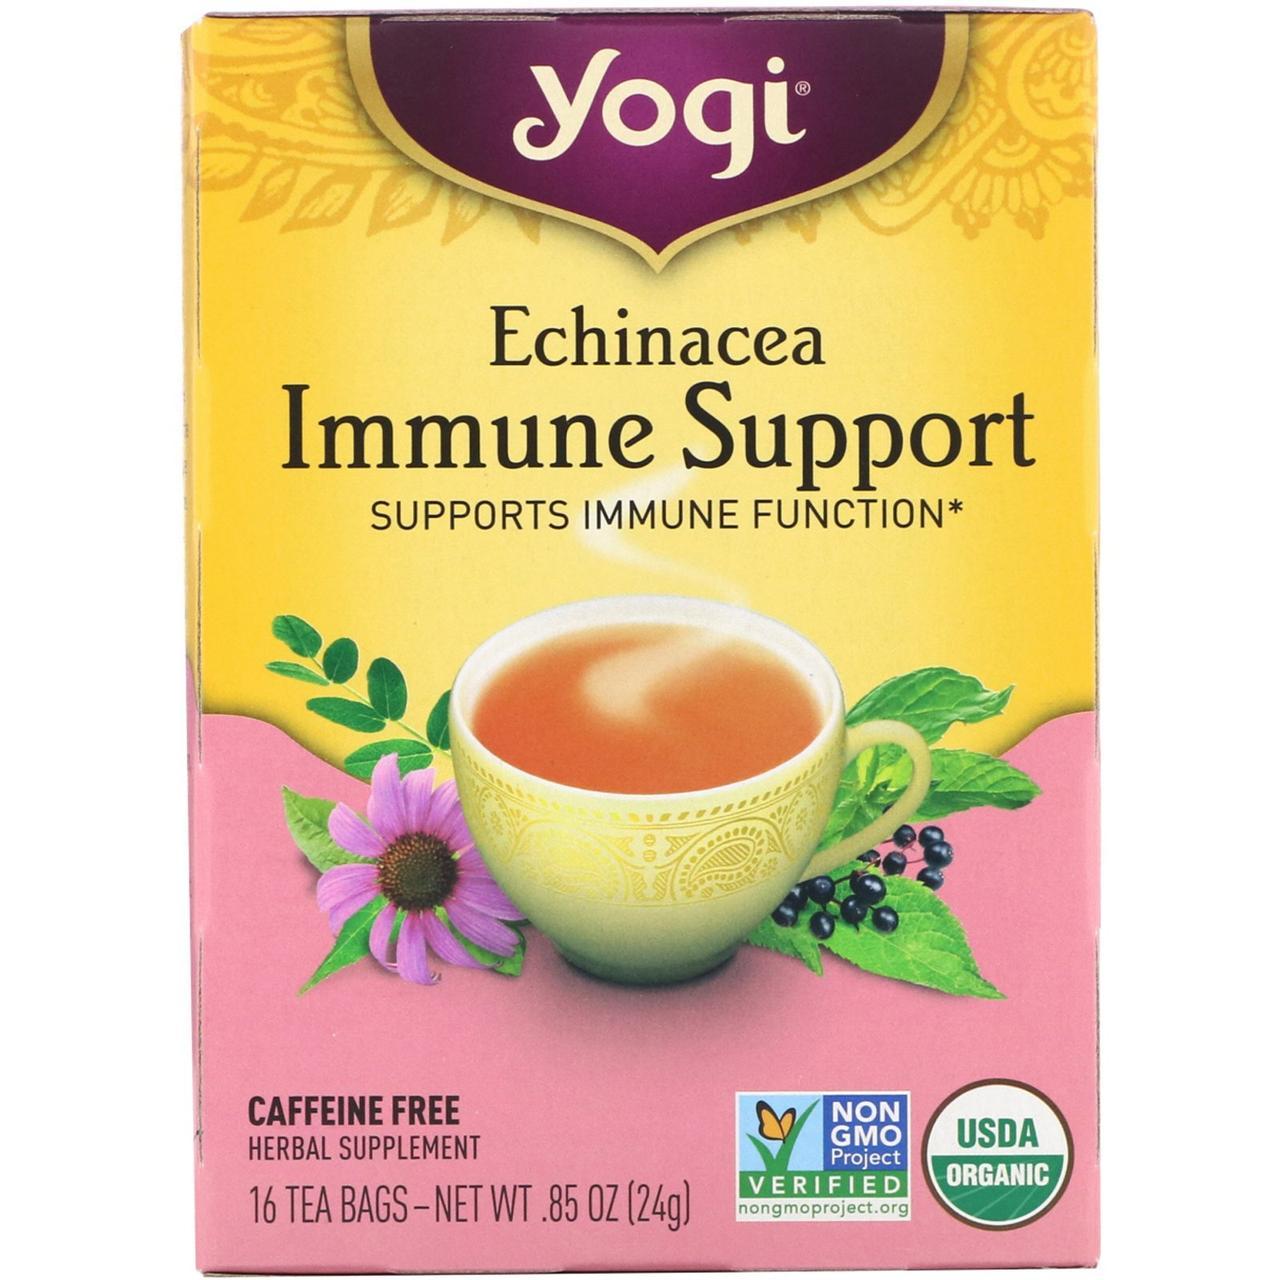 Echinacea Immune Support, без кофеина, 16 чайных пакетиков, 24 г, Yogi Tea